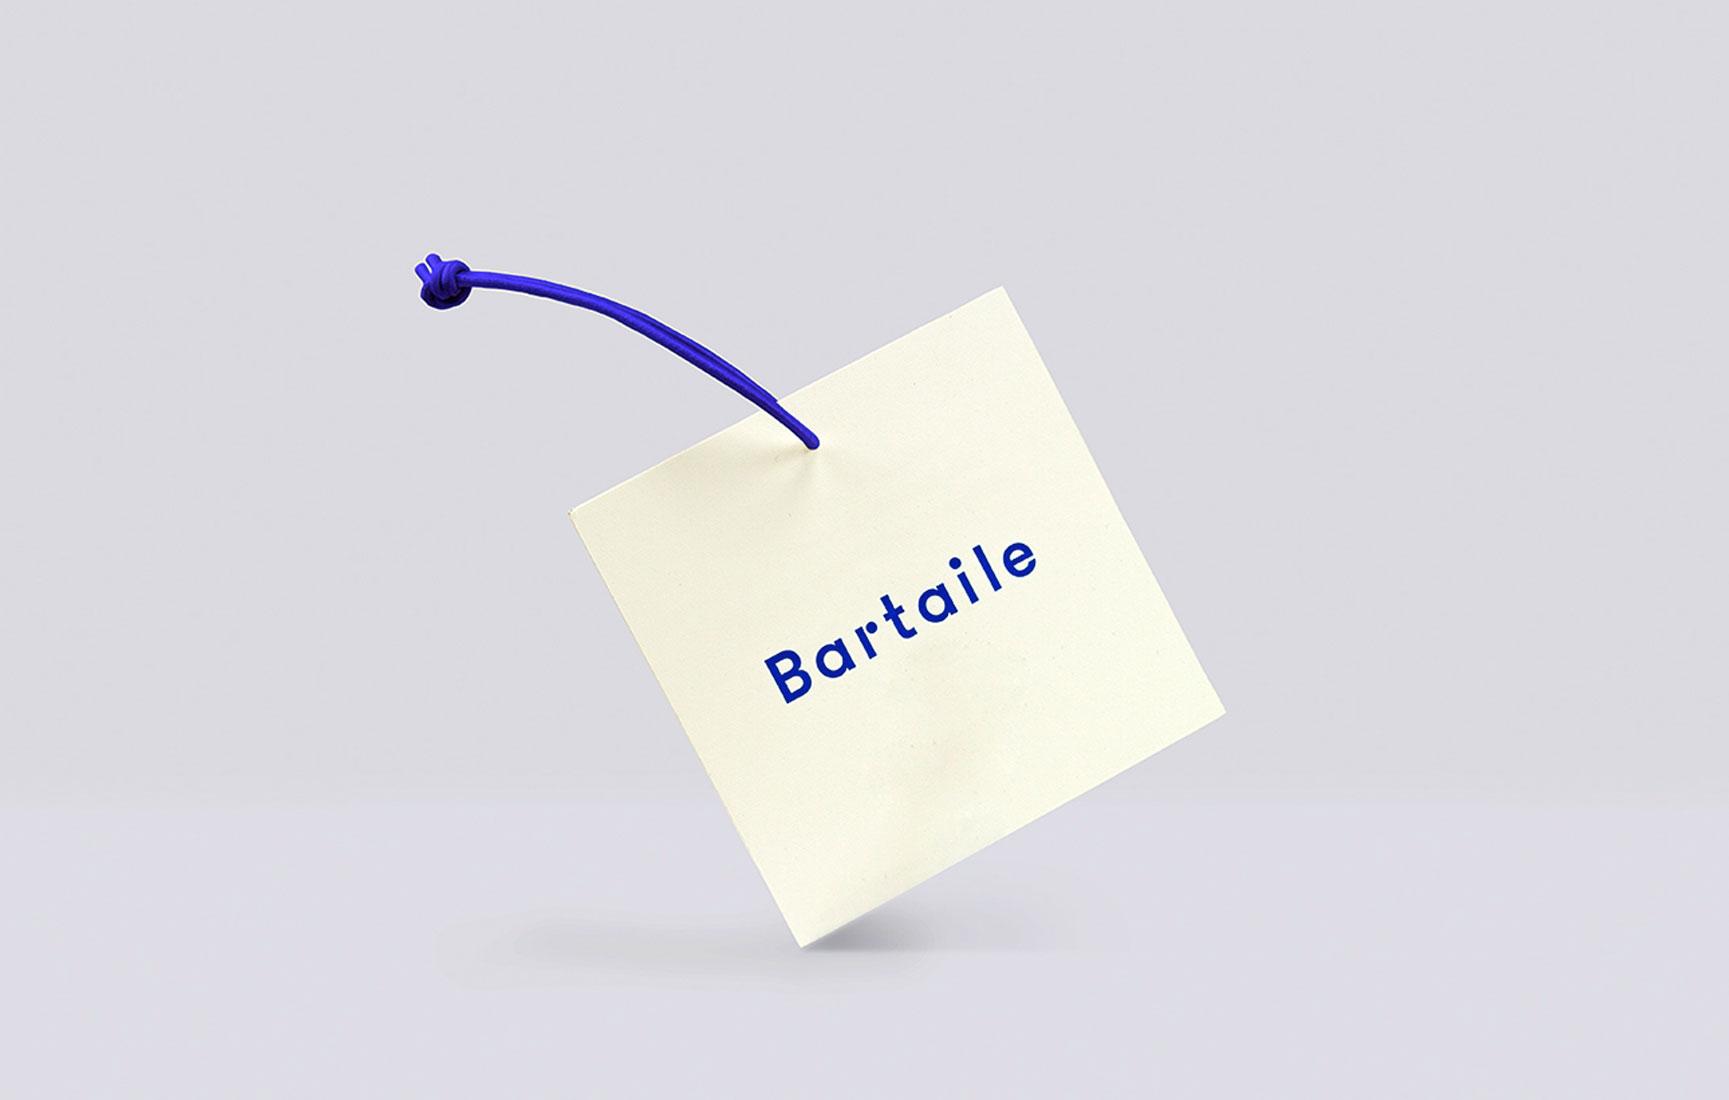 bartaile_work_02